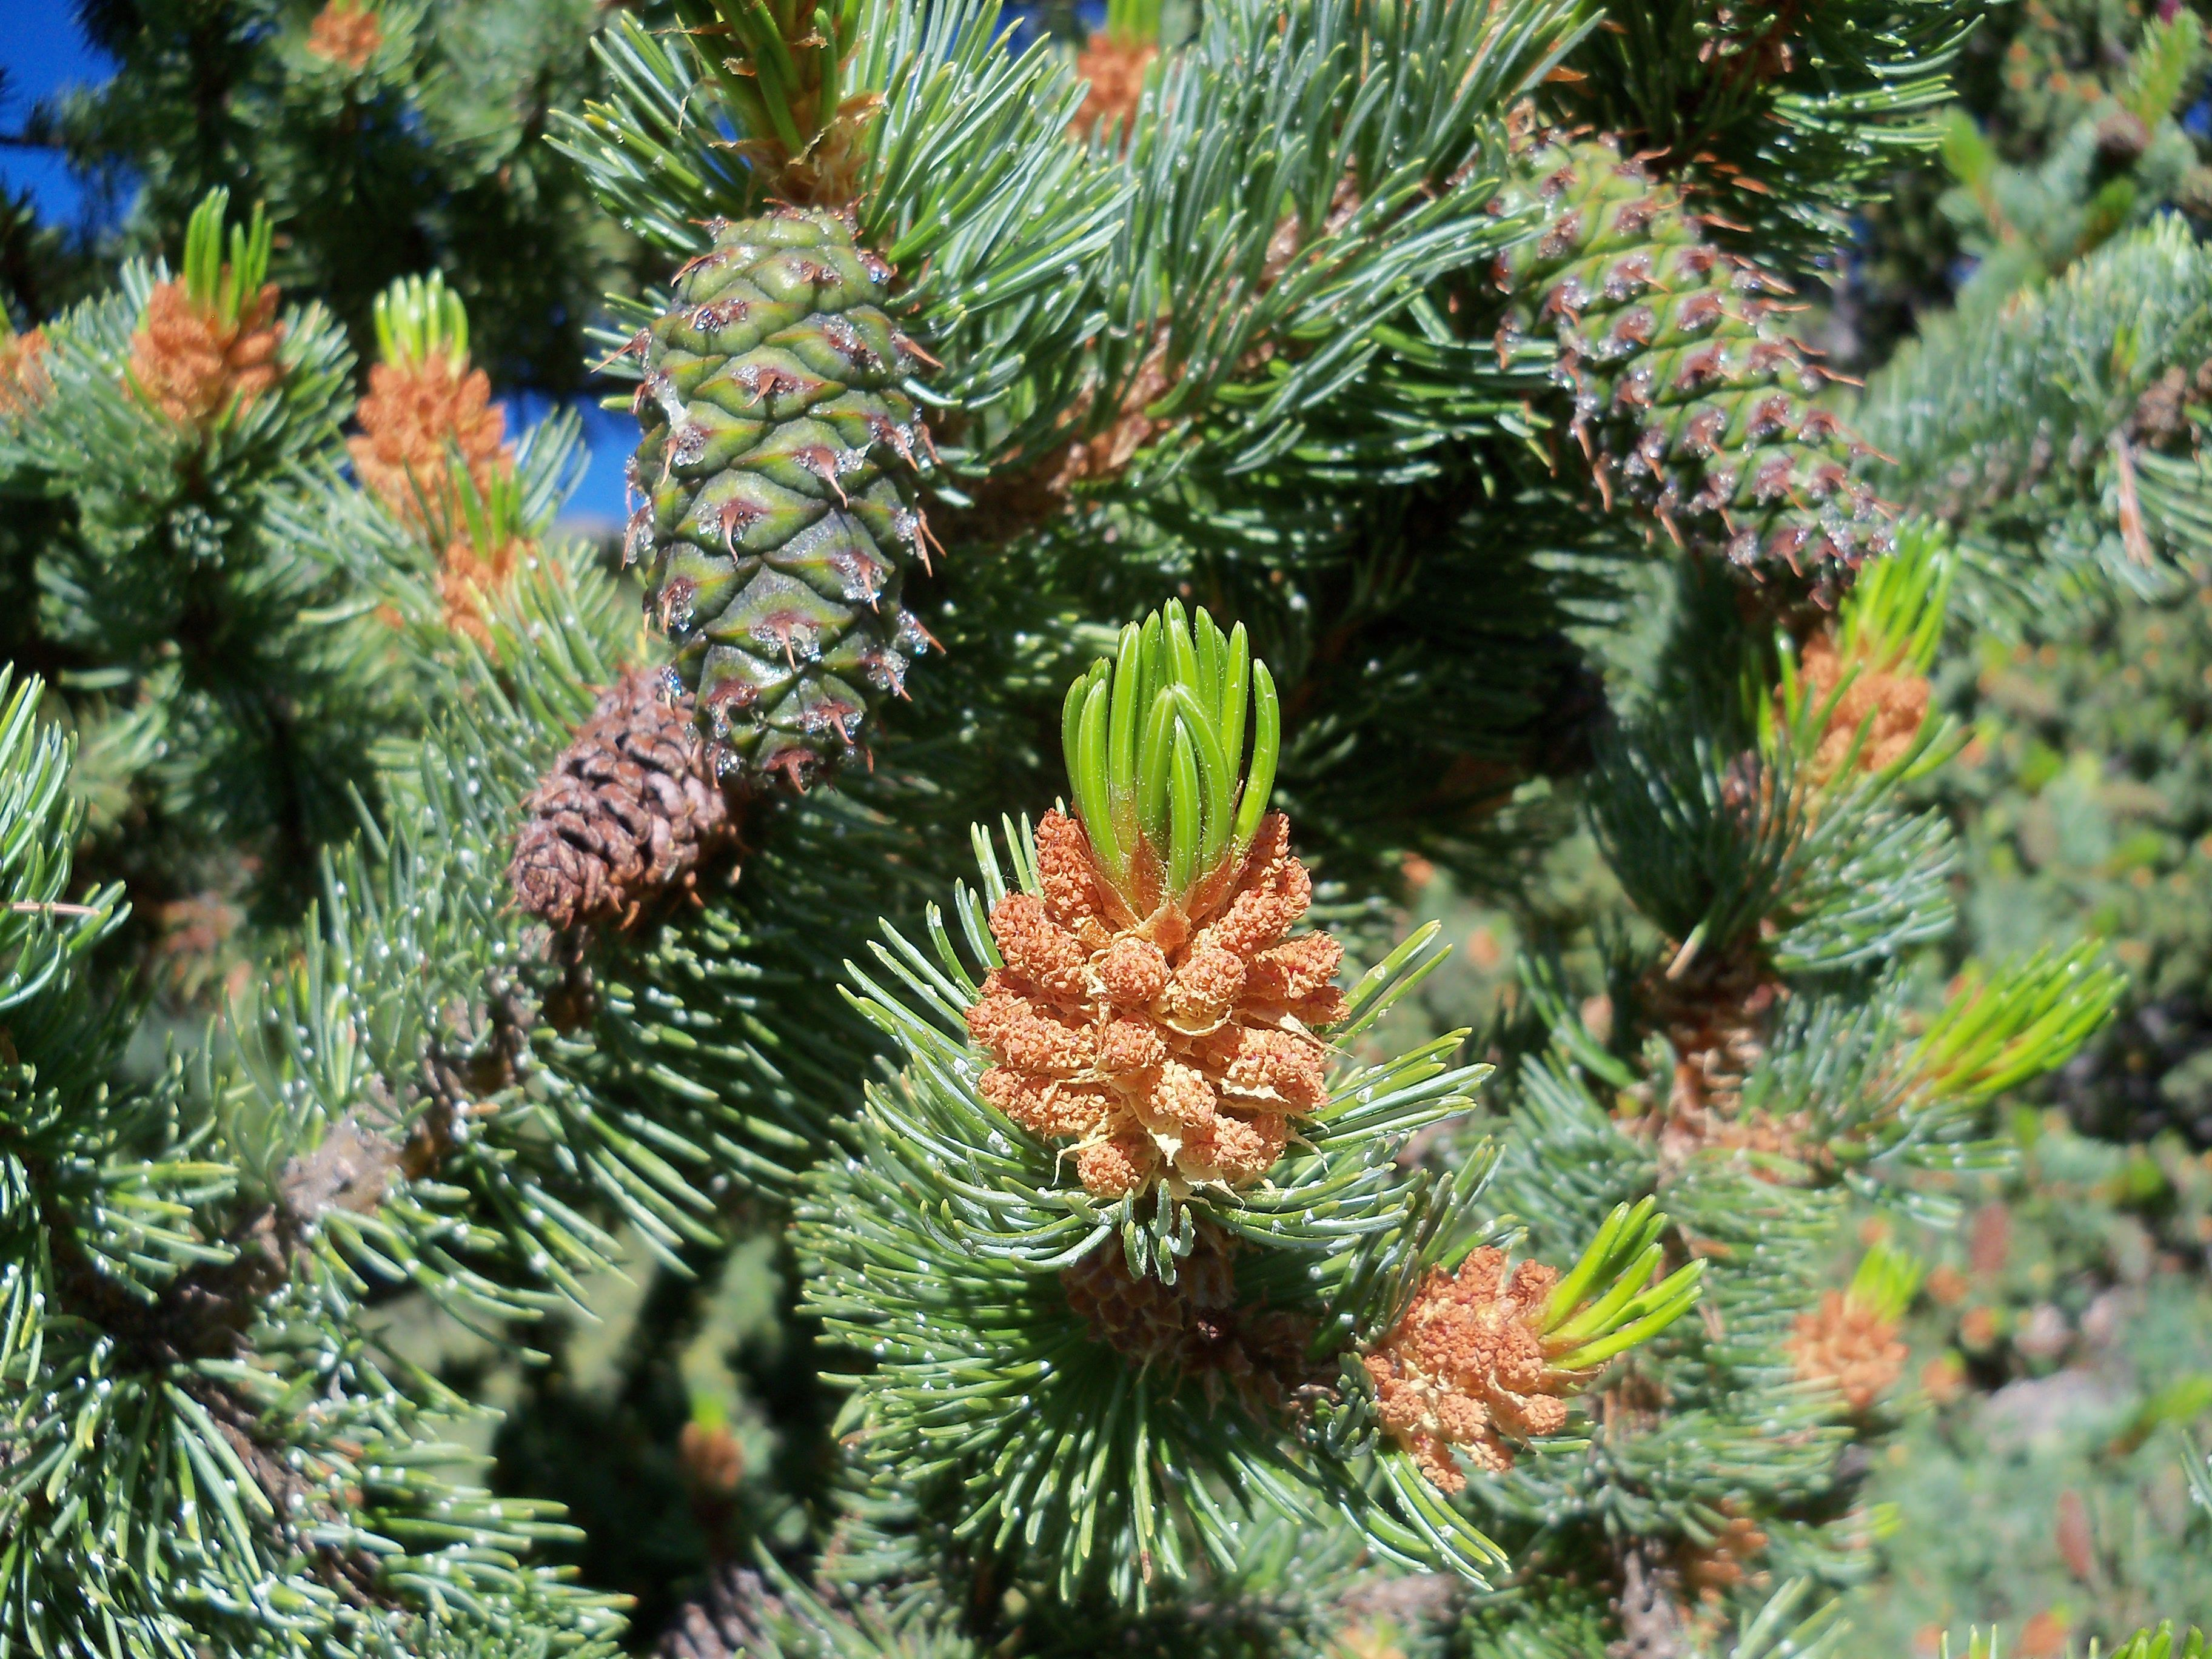 Dream Dream Fir, spruce, what dreams of Fir, spruce in a dream to see 100